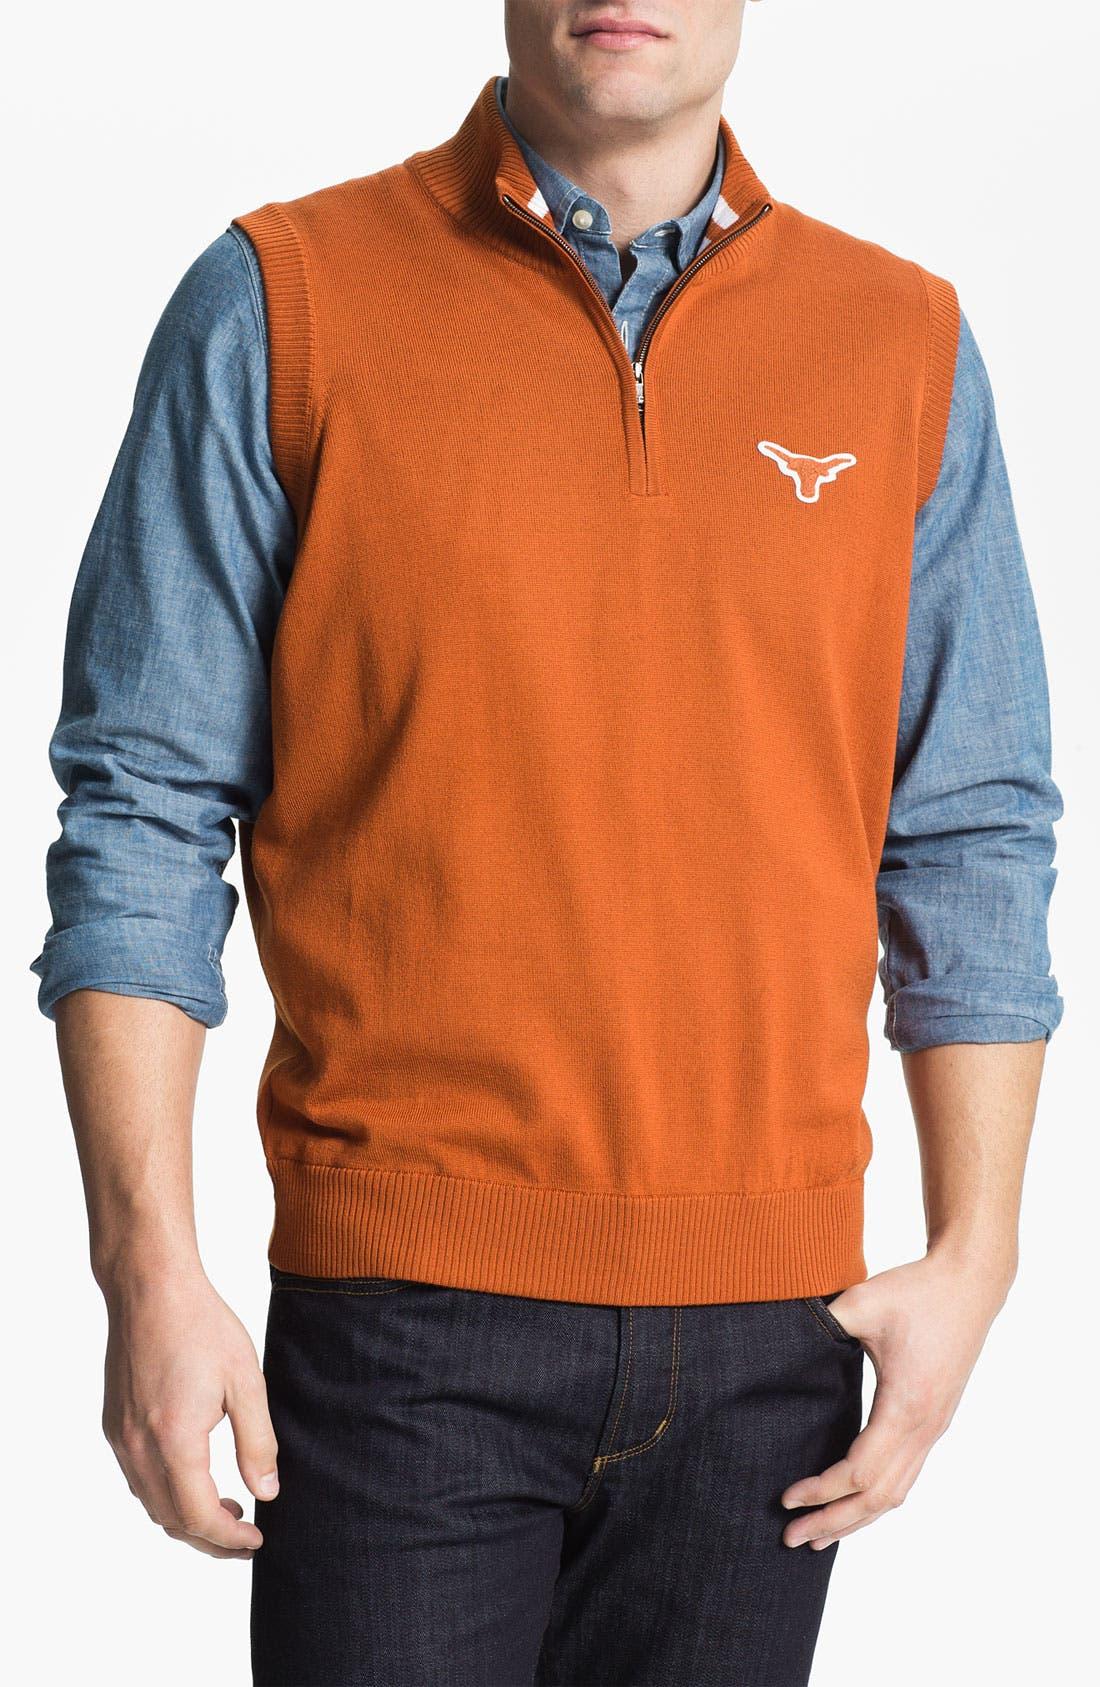 Alternate Image 1 Selected - Thomas Dean 'Texas' Quarter Zip Sweater Vest